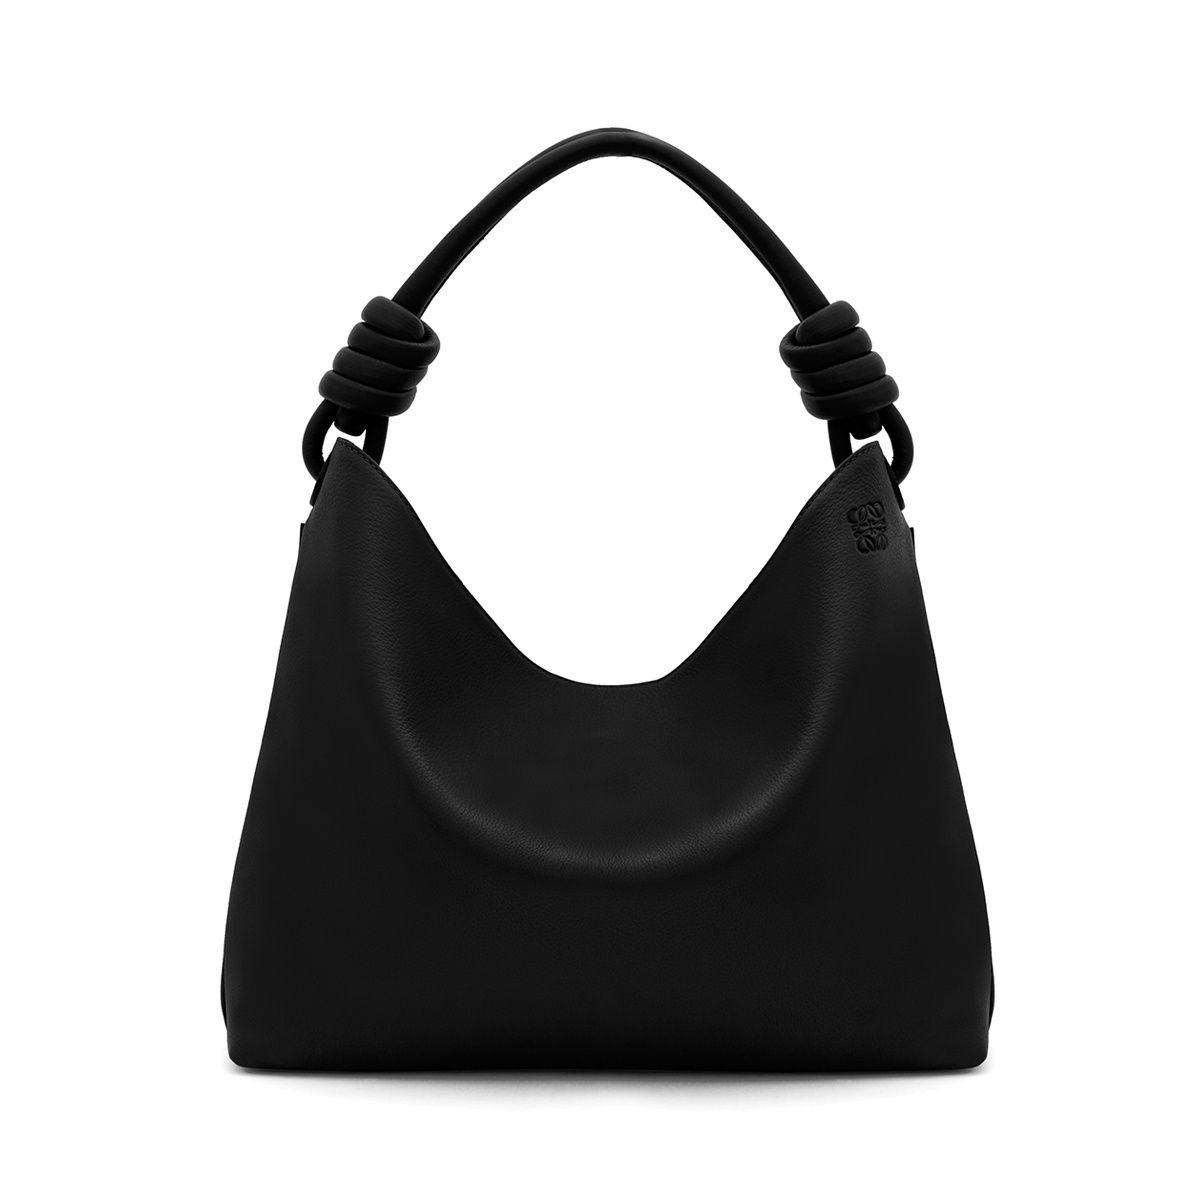 BAG Black Flamenco Pinterest S BAG Loewe LARGE HOBO 8AqI1X